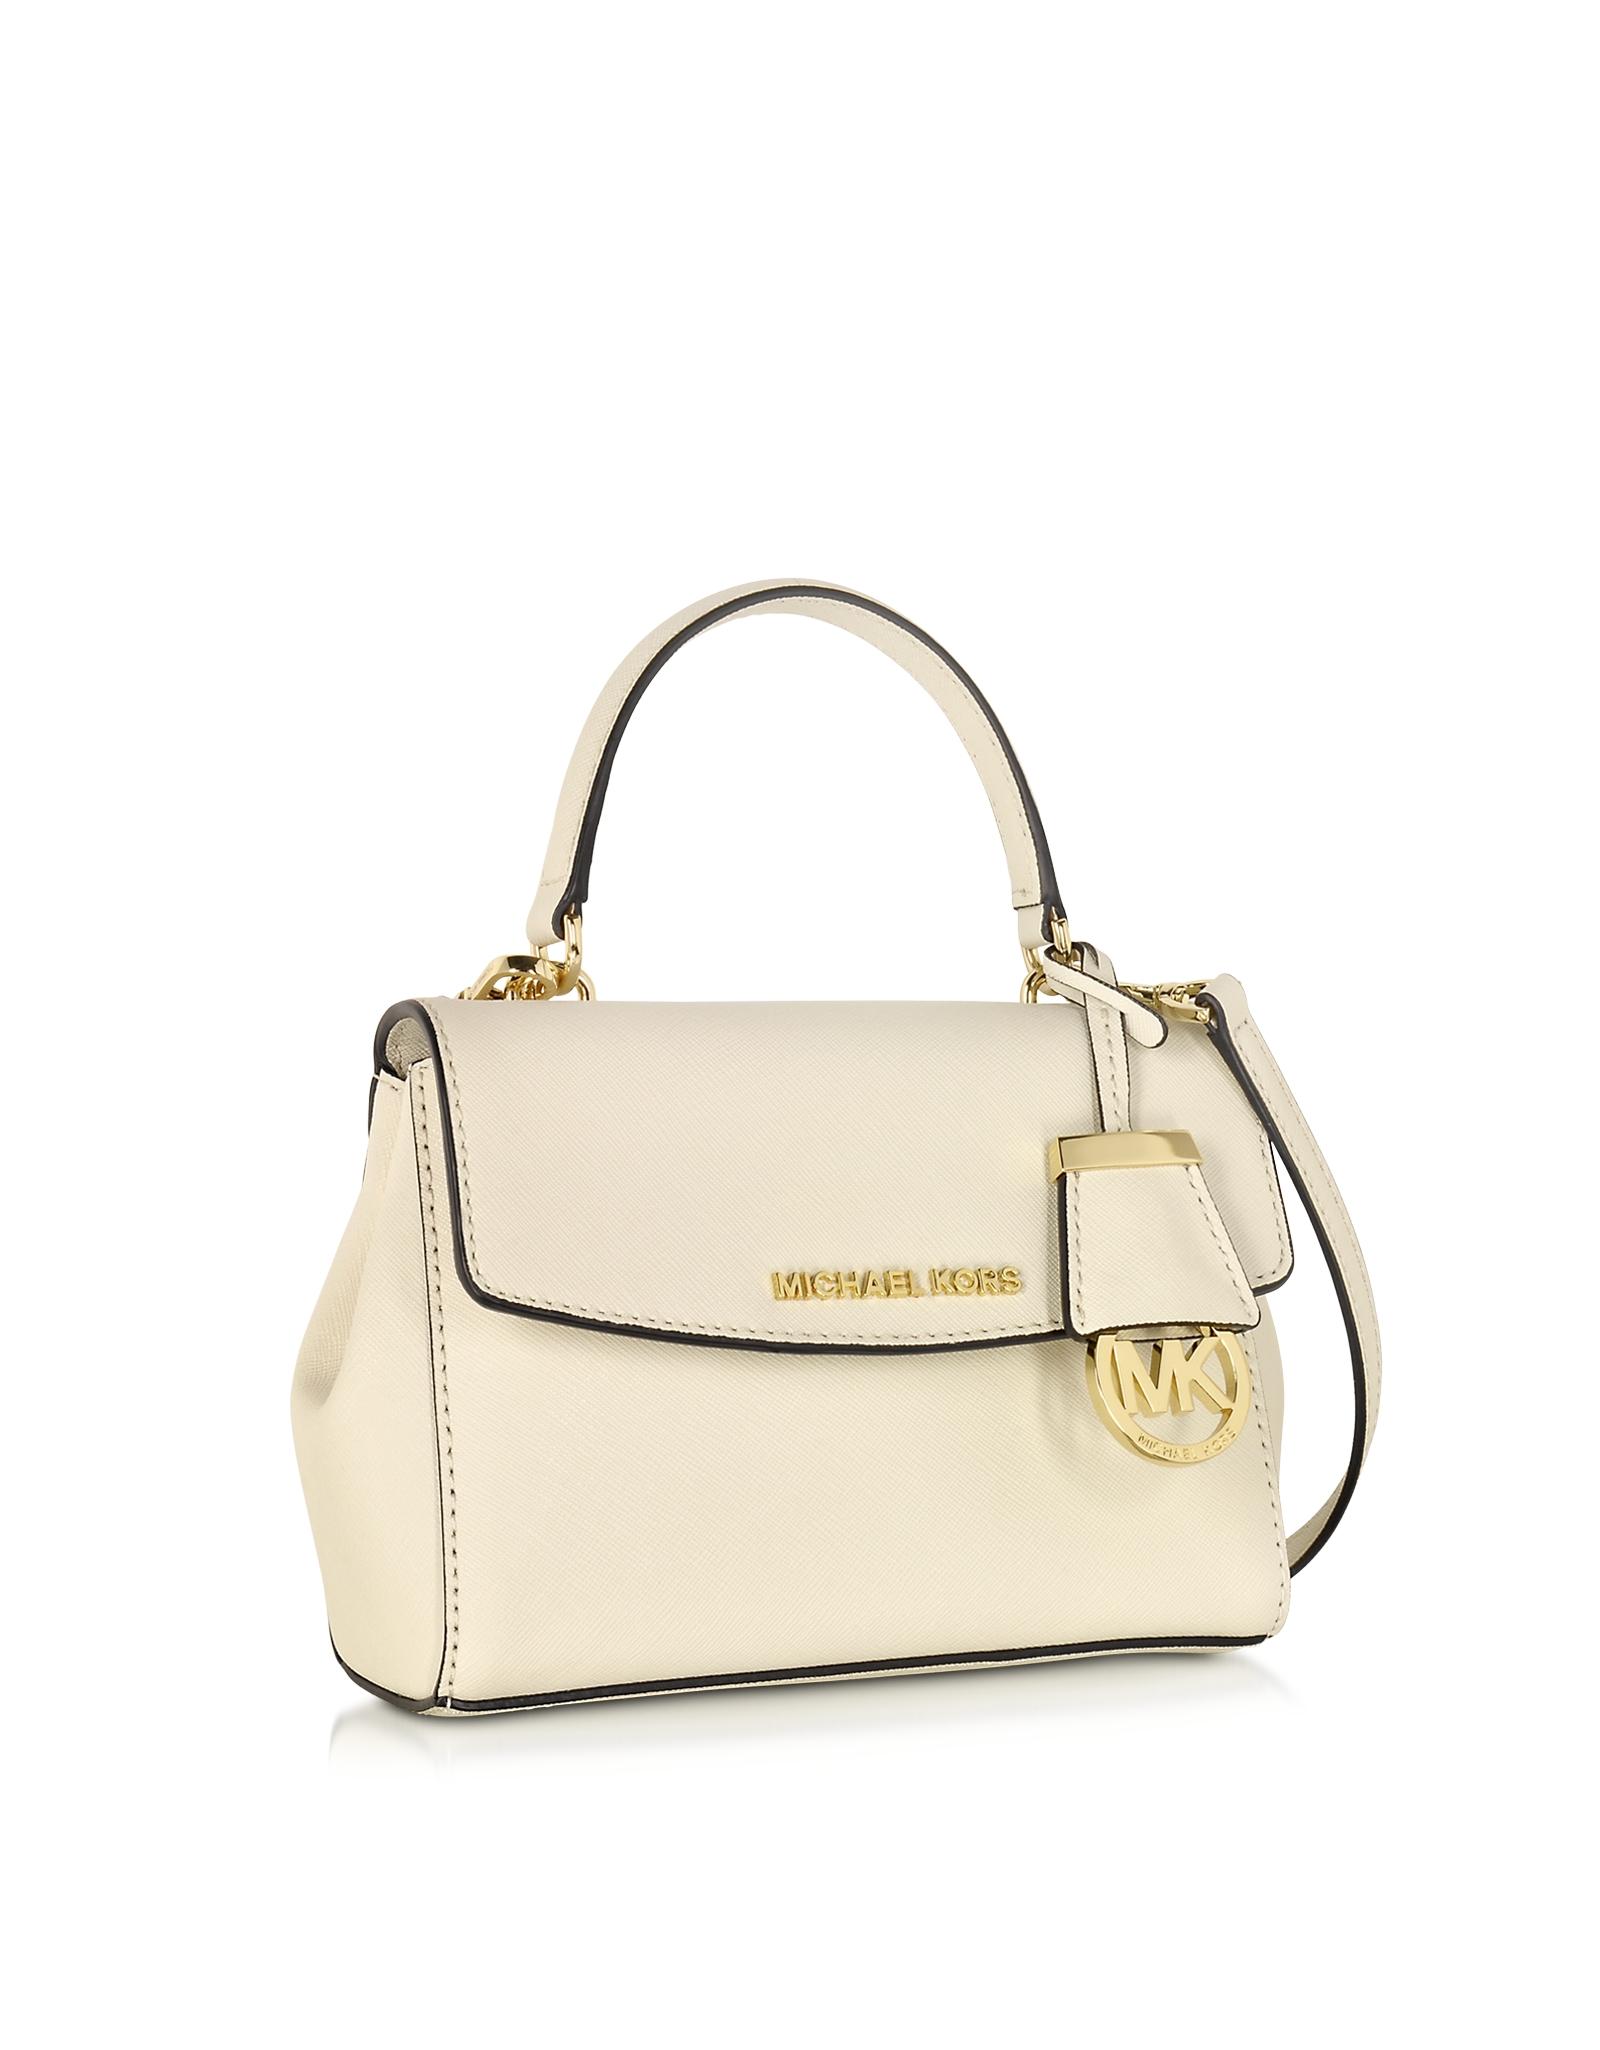 2edc7d1feebc8b Michael Kors Ava Ecru Saffiano Leather Extra Small Crossbody Bag in ...